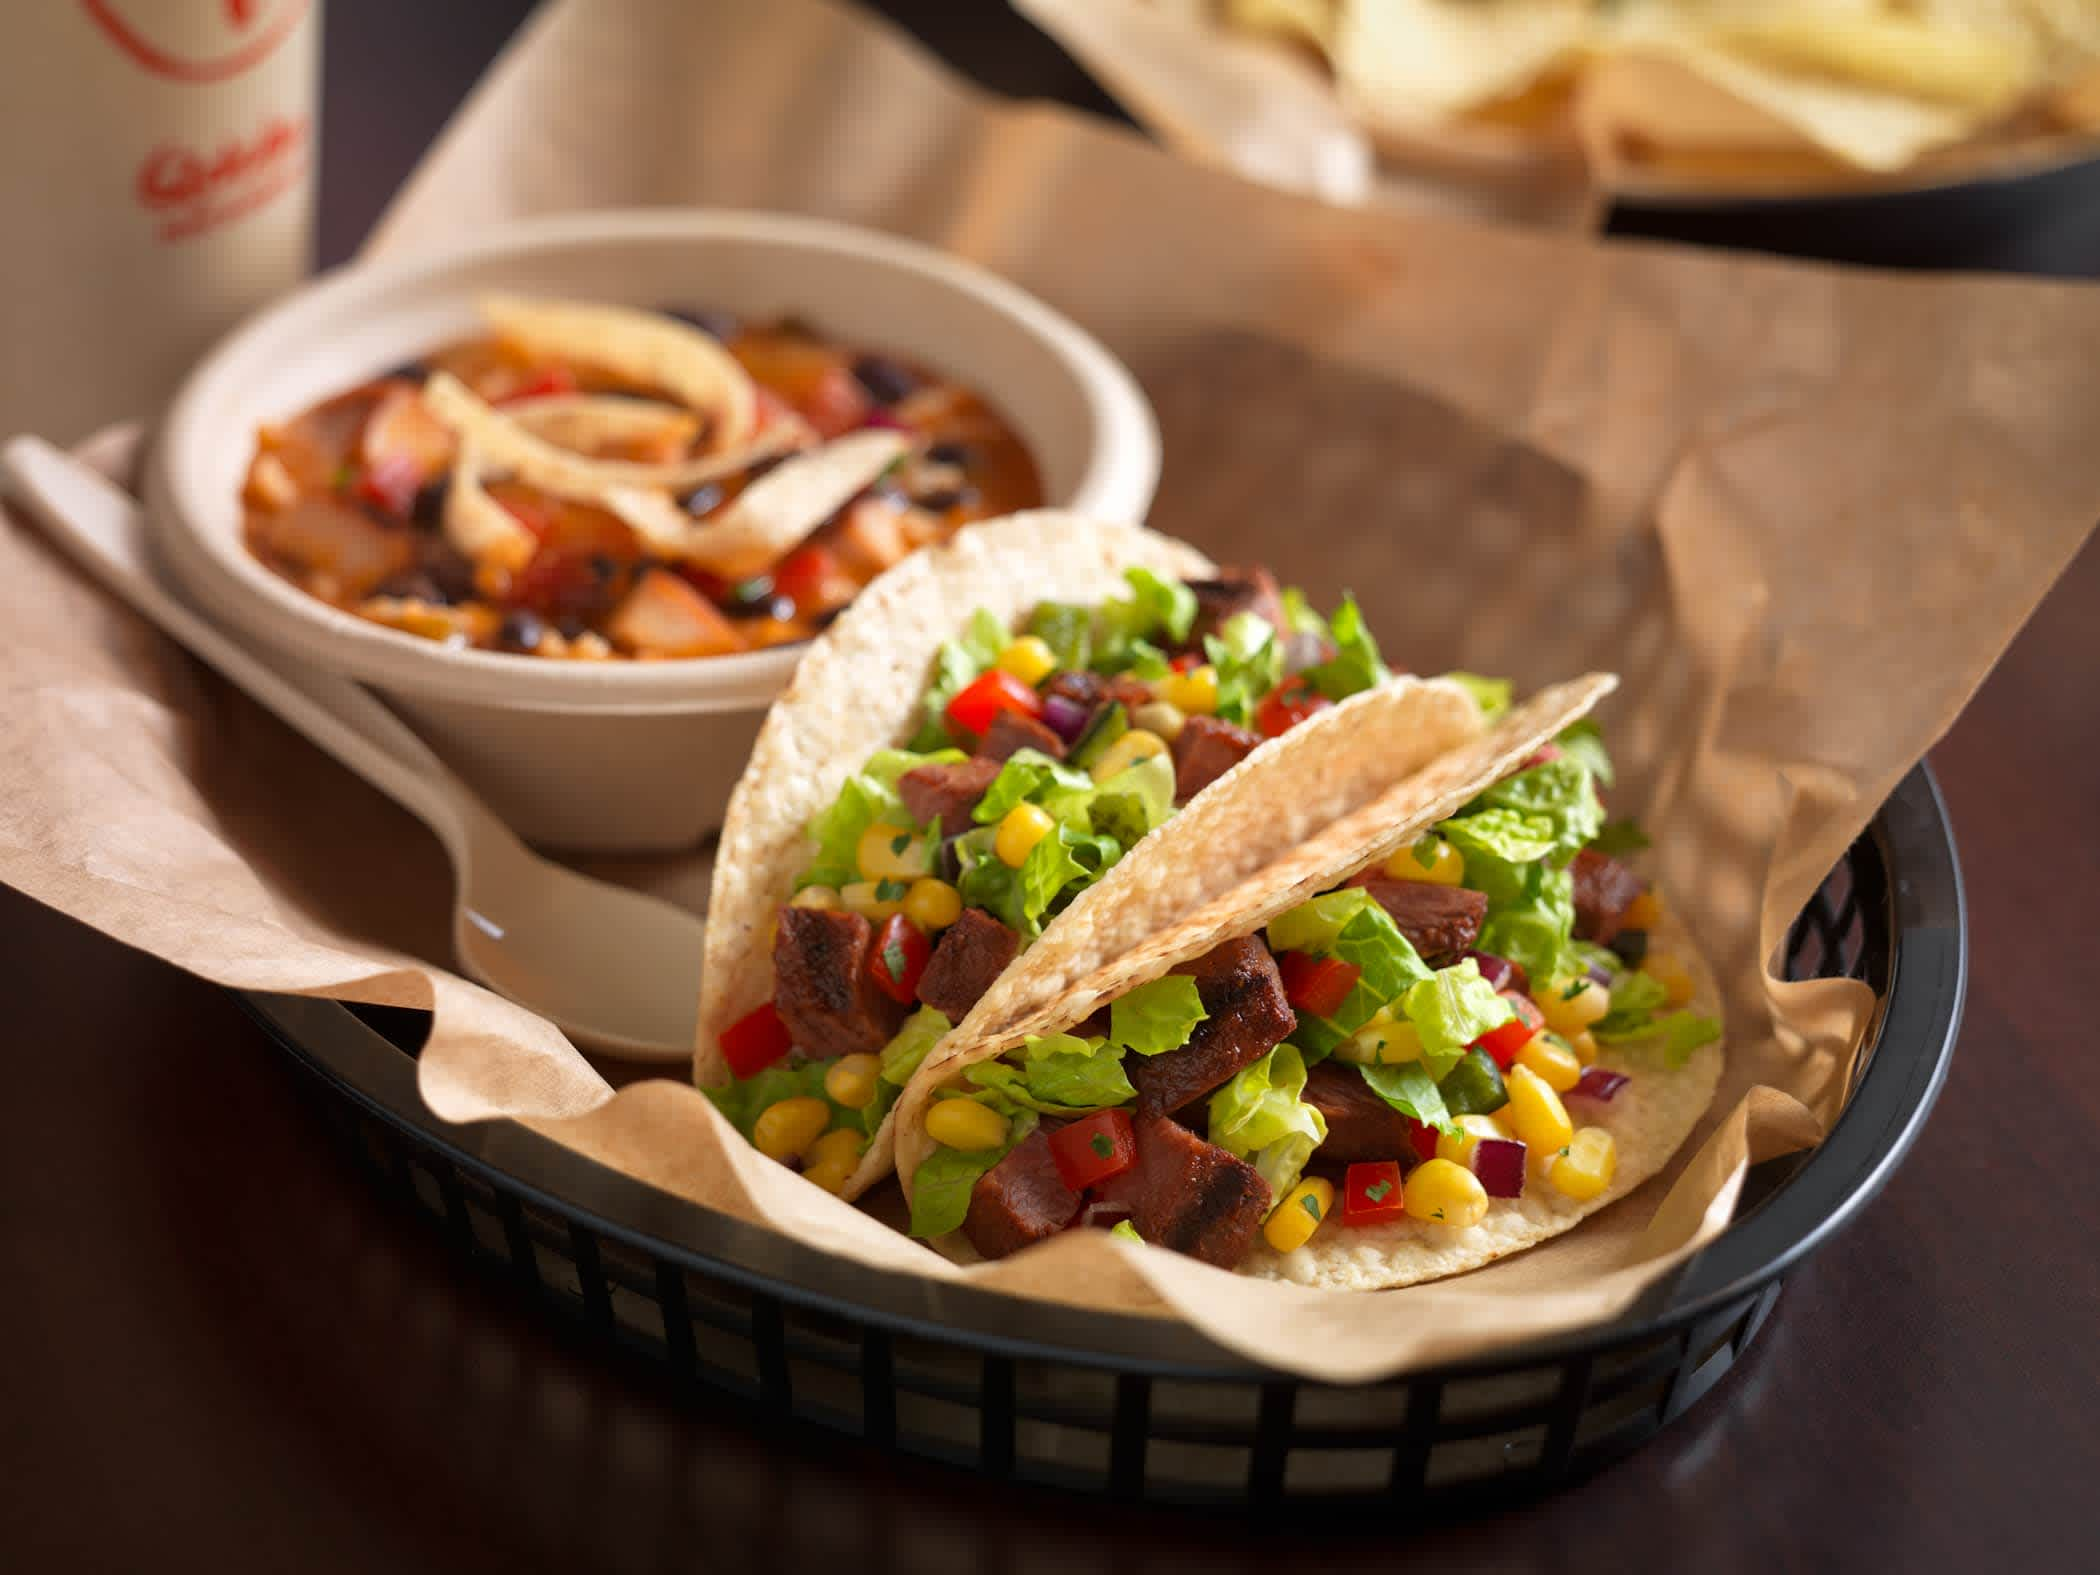 Qdoba Mexican Grill - Reviews & Menu - Paramus 07652